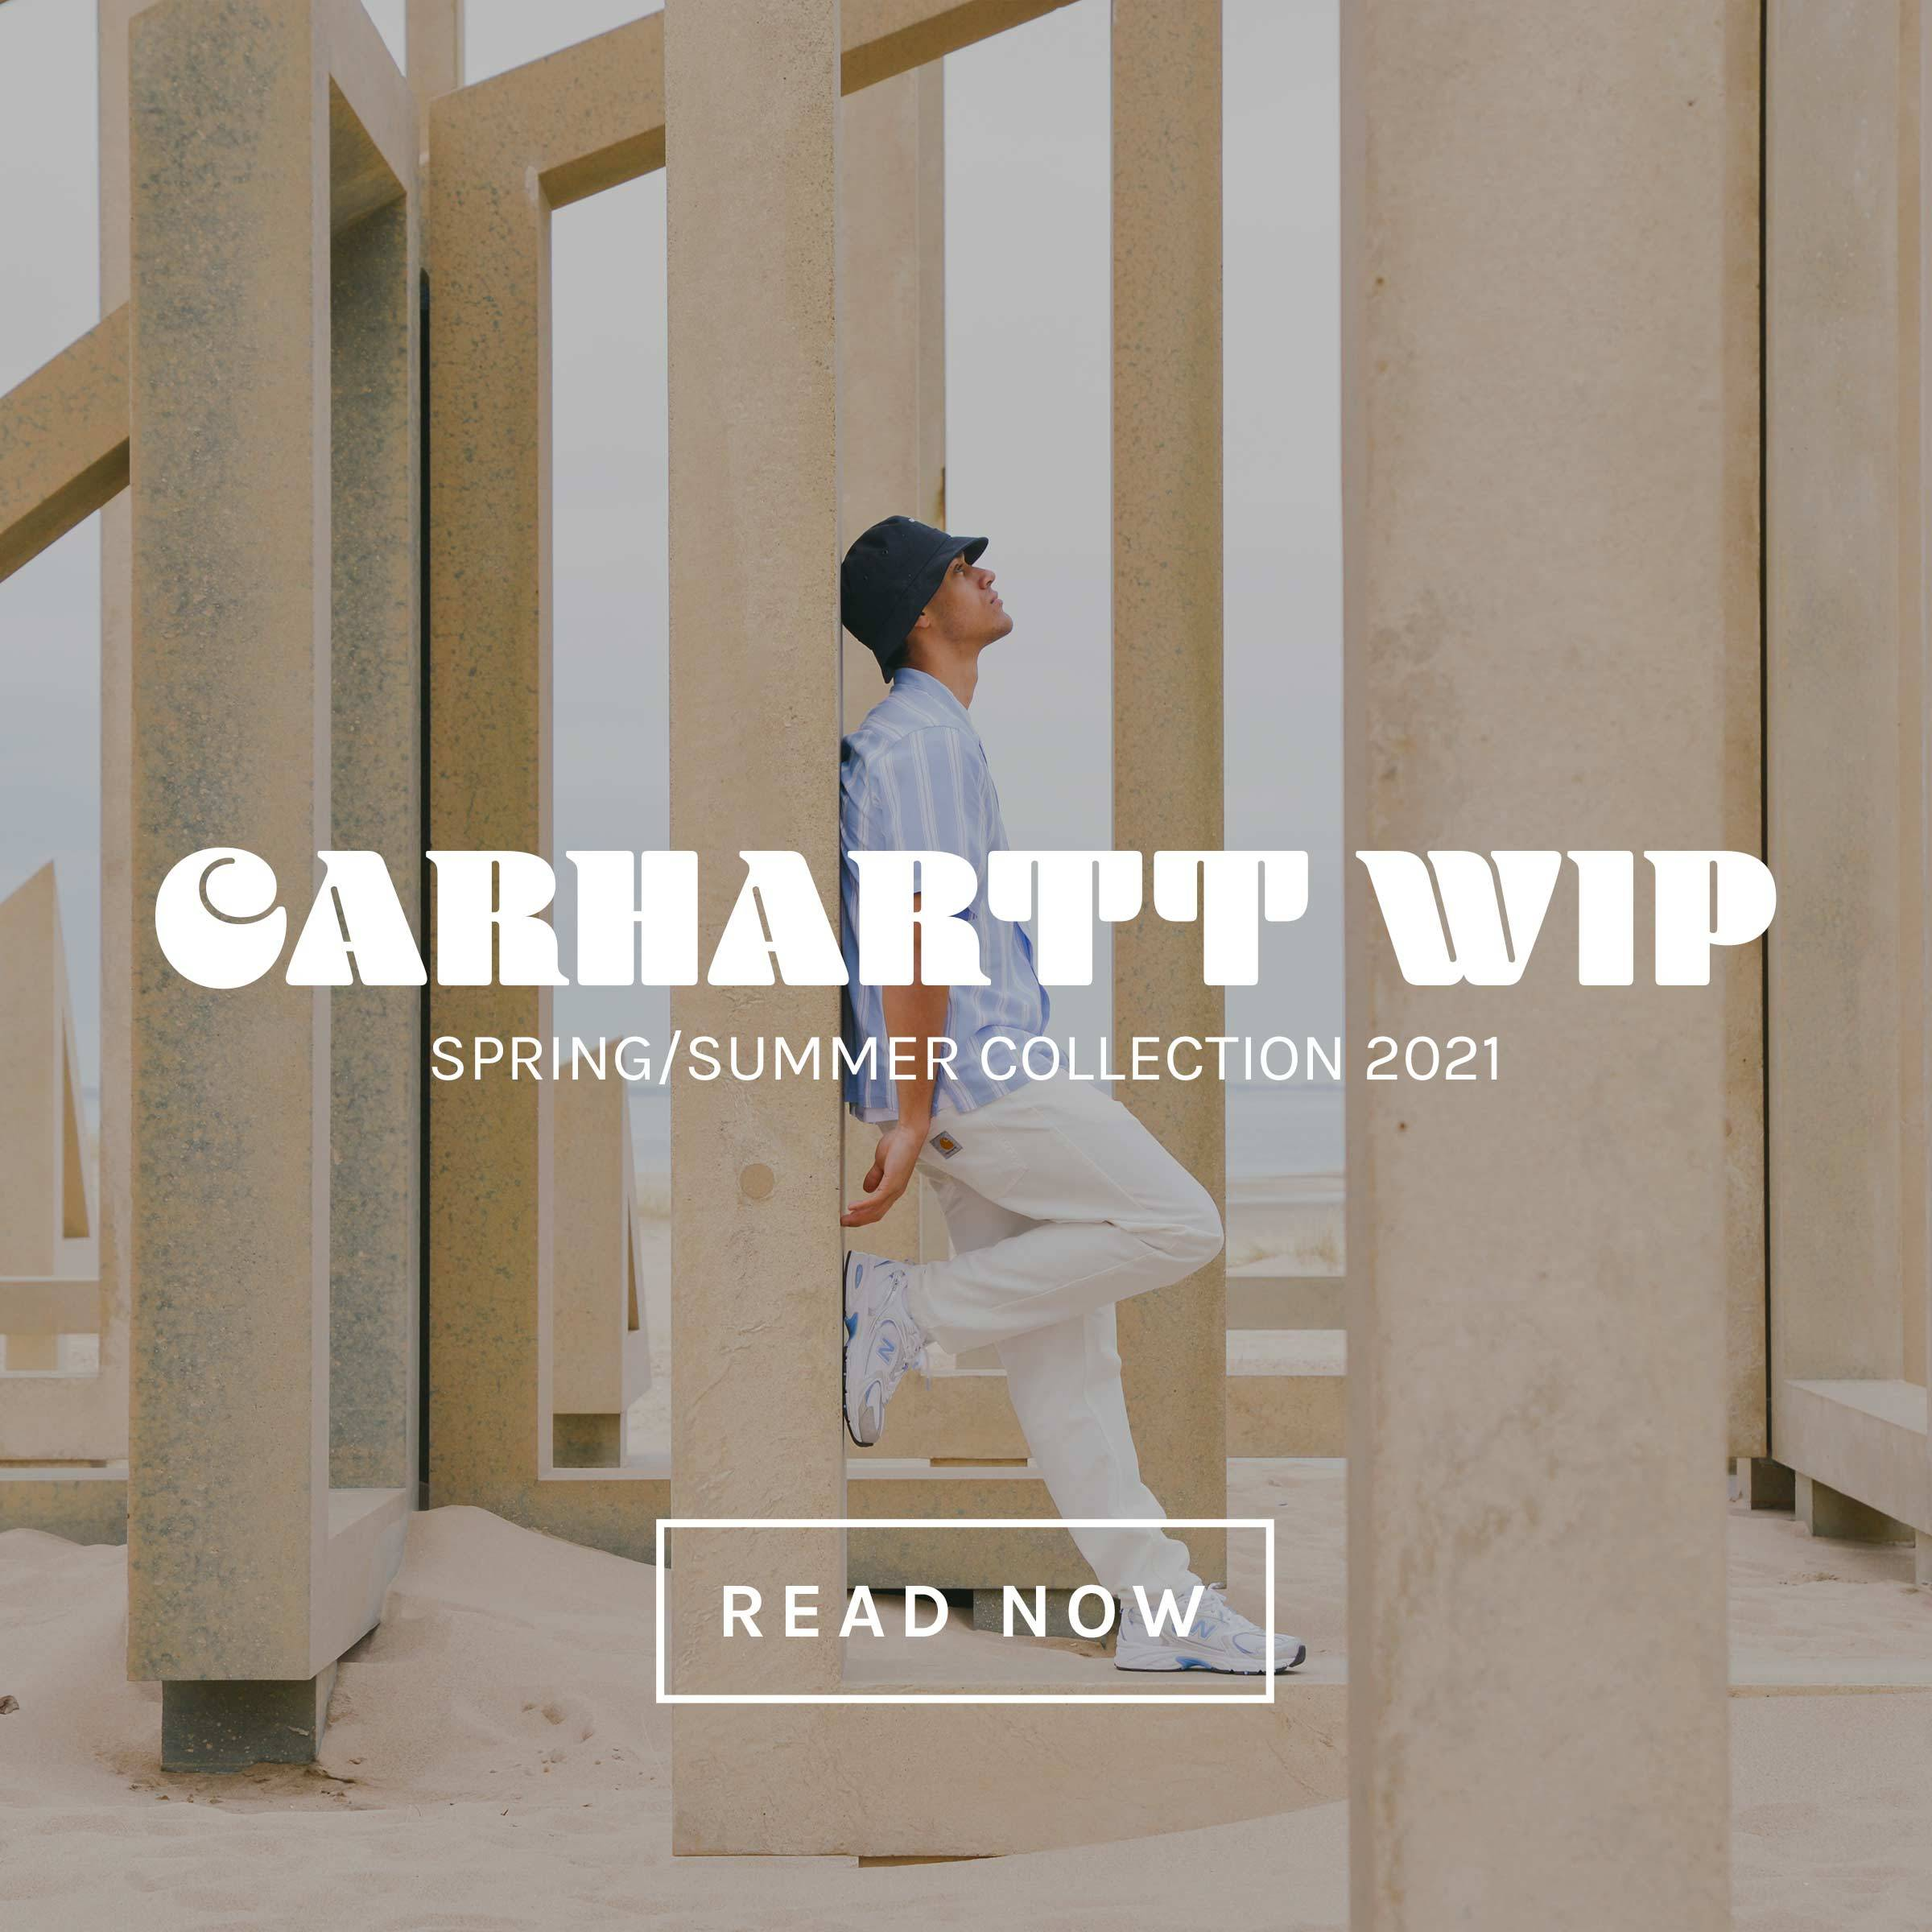 CARHATT WIP